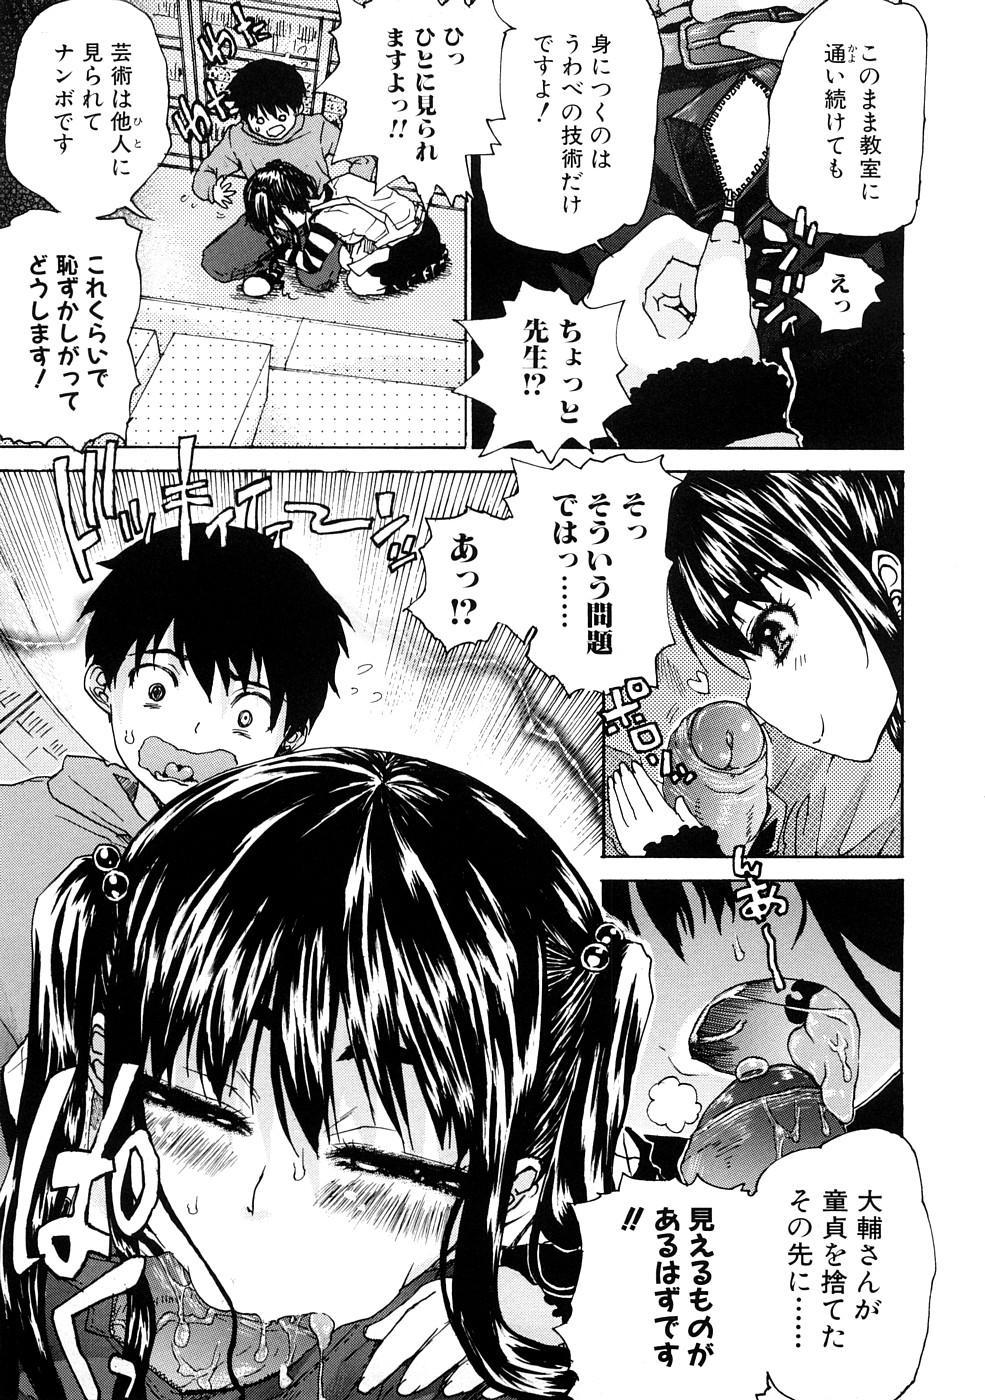 Ecchi de Jibunkatte de Kawaii Ko 86